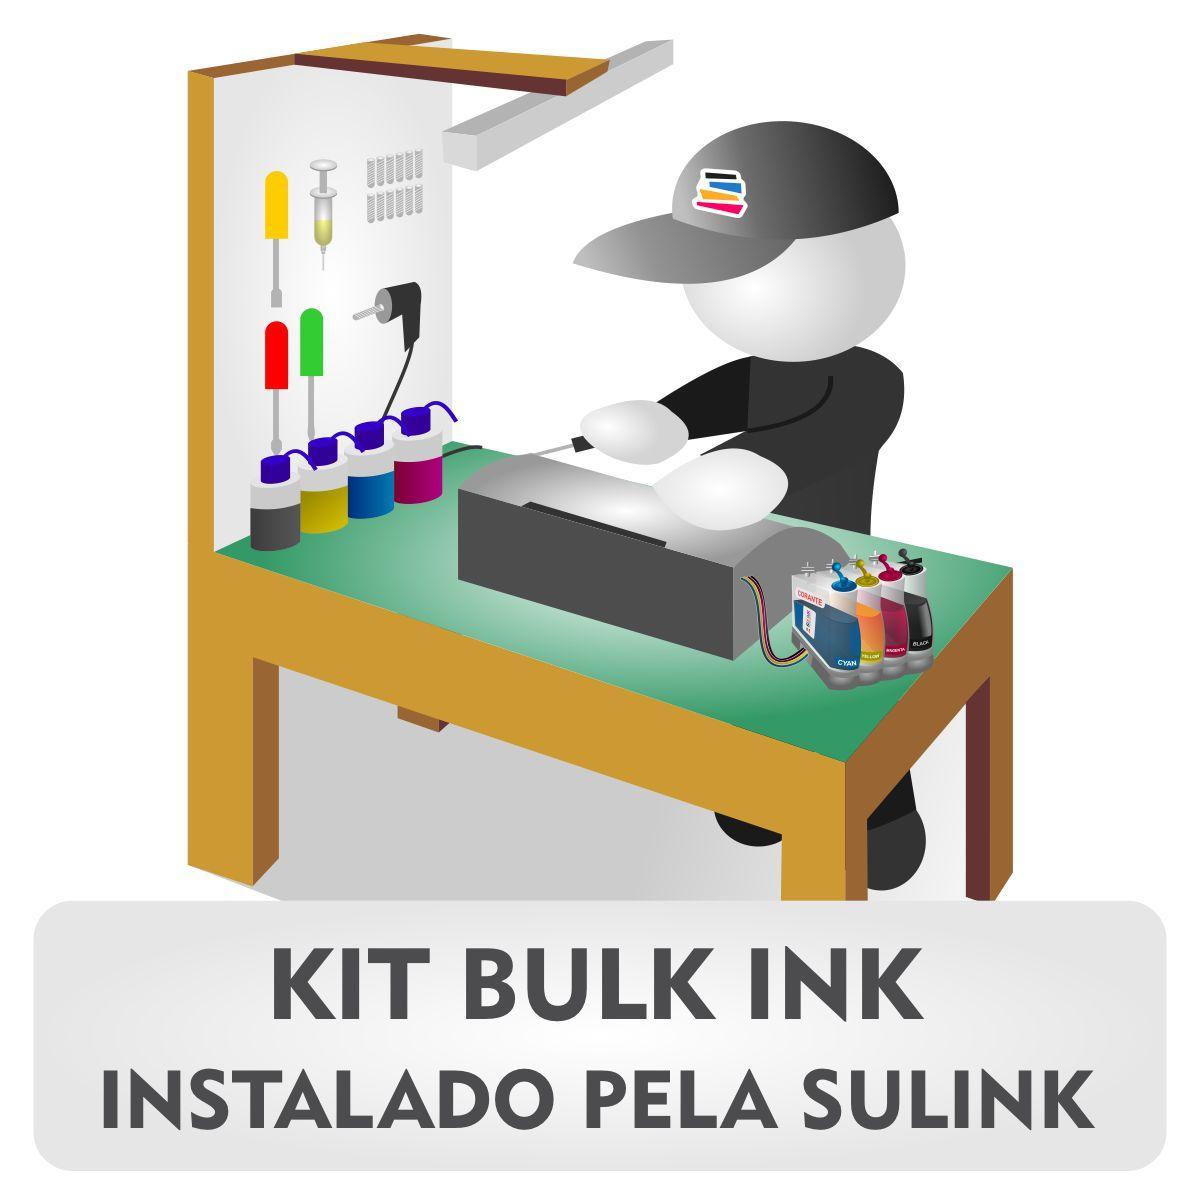 INSTALADO - Bulk Ink para Canon IX6810 - 5 Cores Tinta Específica para Canon Preto Pigmentado e Colorido e Preto Fotográfico Corante - (Sem Cartucho - Utilizar Original CANON do Cliente)